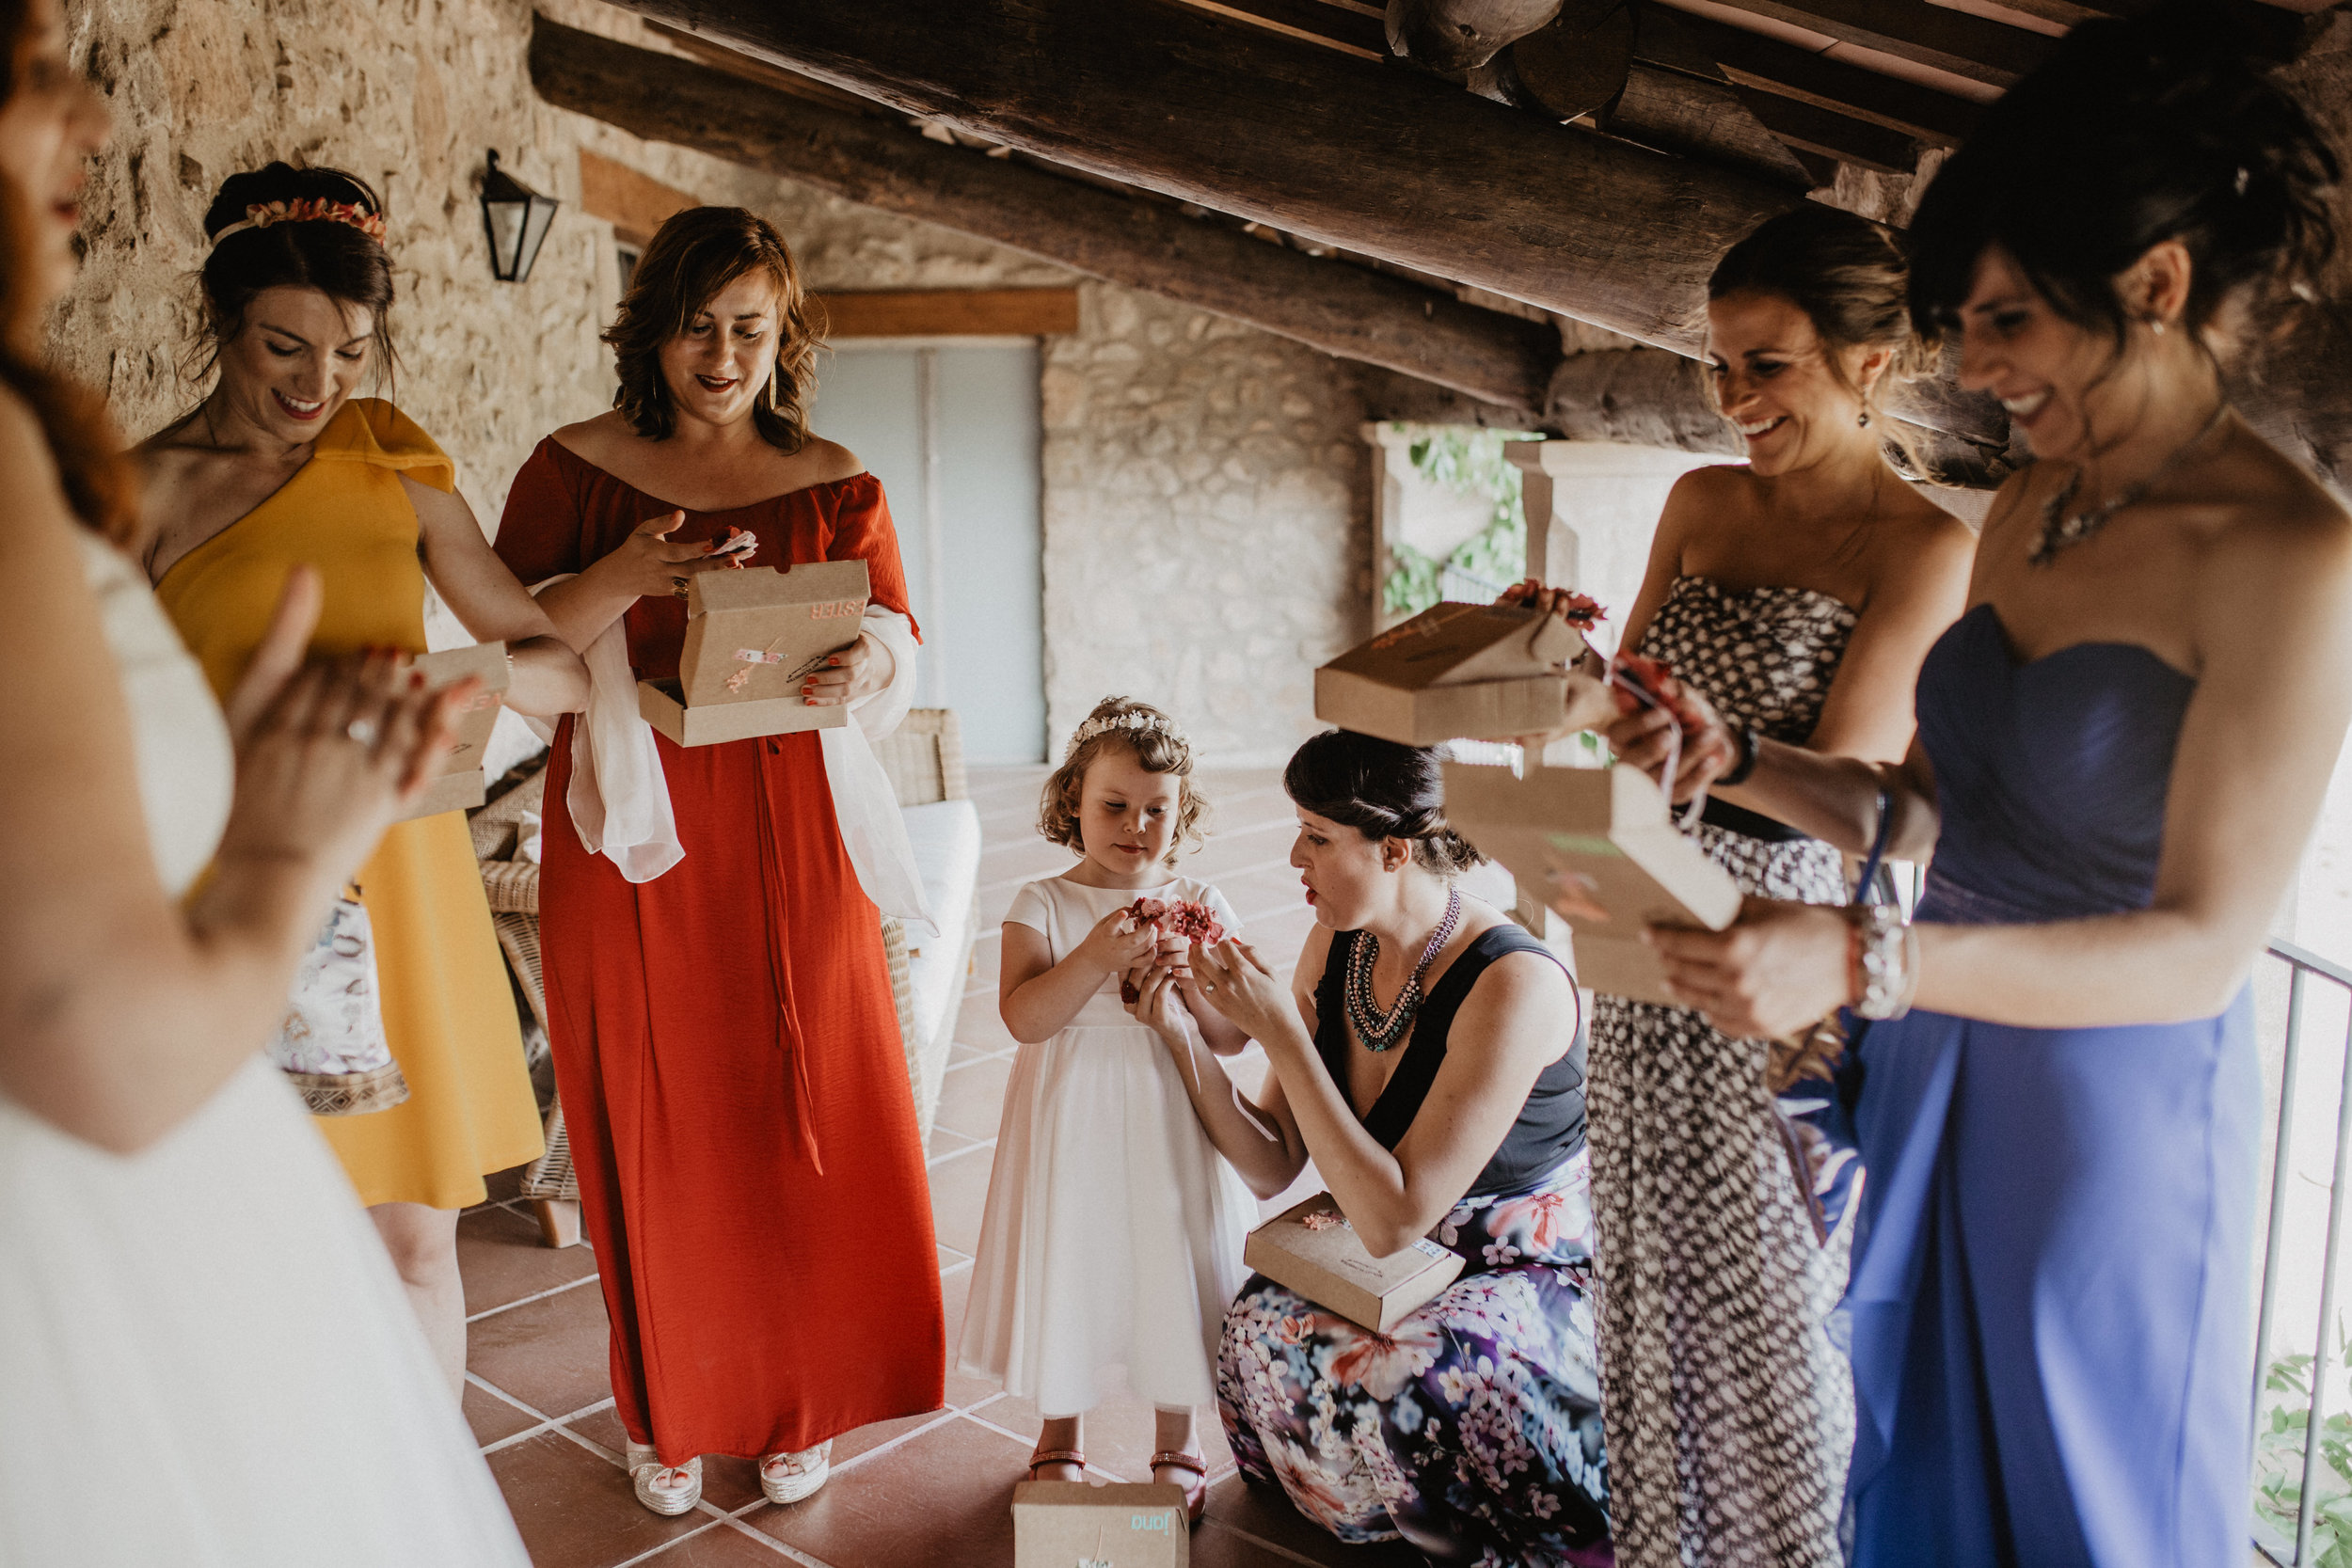 thenortherngirlphotography_photography_thenortherngirl_rebeccascabros_wedding_weddingphotography_masialagarrigadecastelladral_joaniemma_bodaenbarcelona_weddingphotographer_emmaijoan-186.jpg